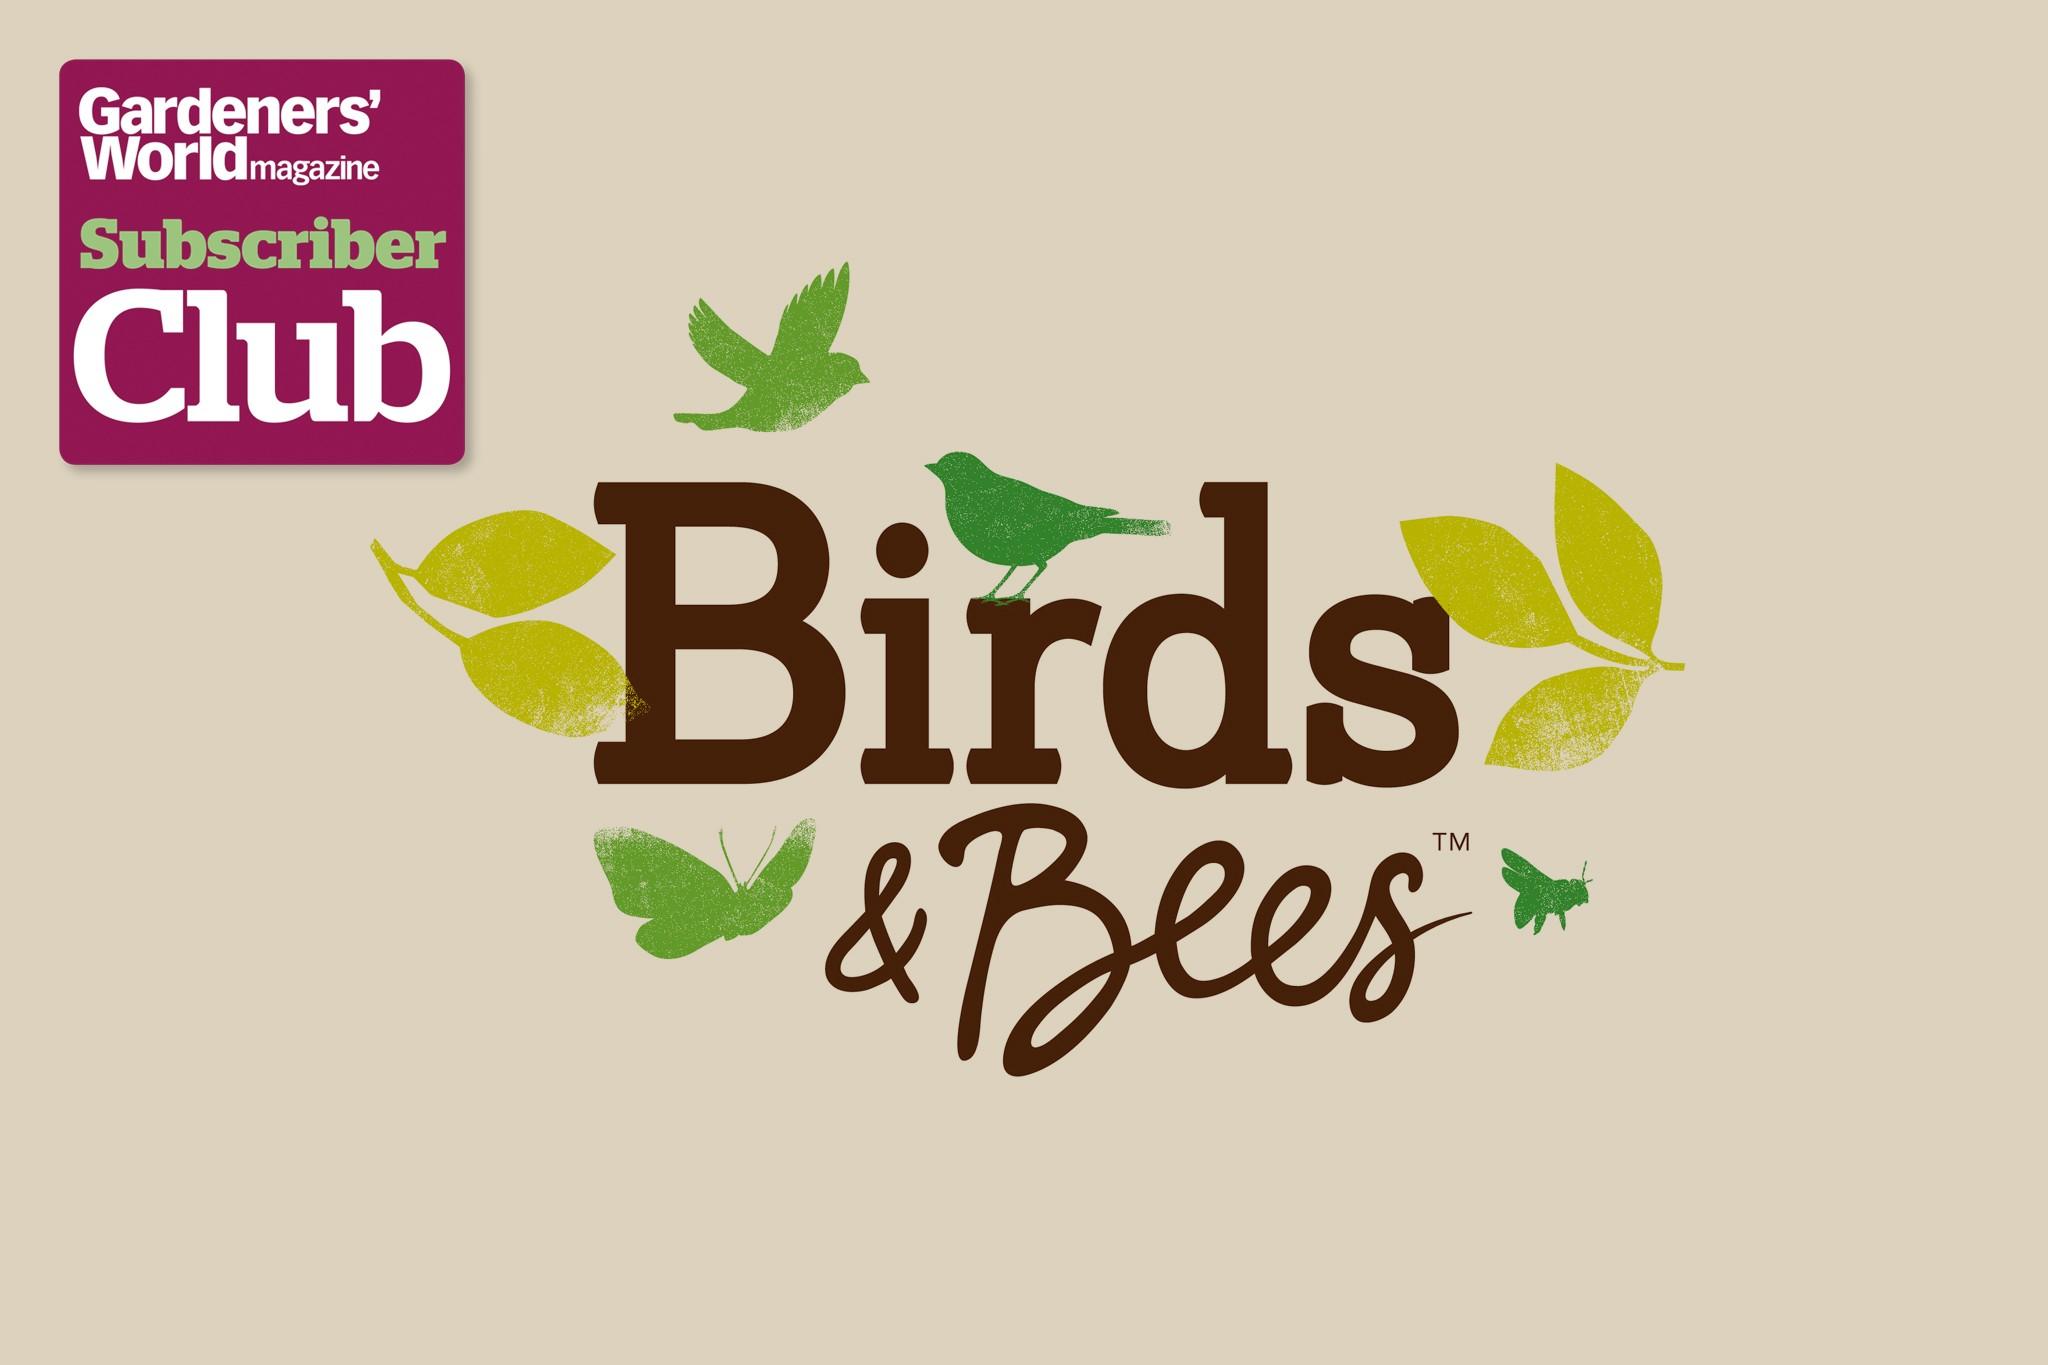 Birds & Bees BBC Gardeners' World Magazine Subscriber Club discount